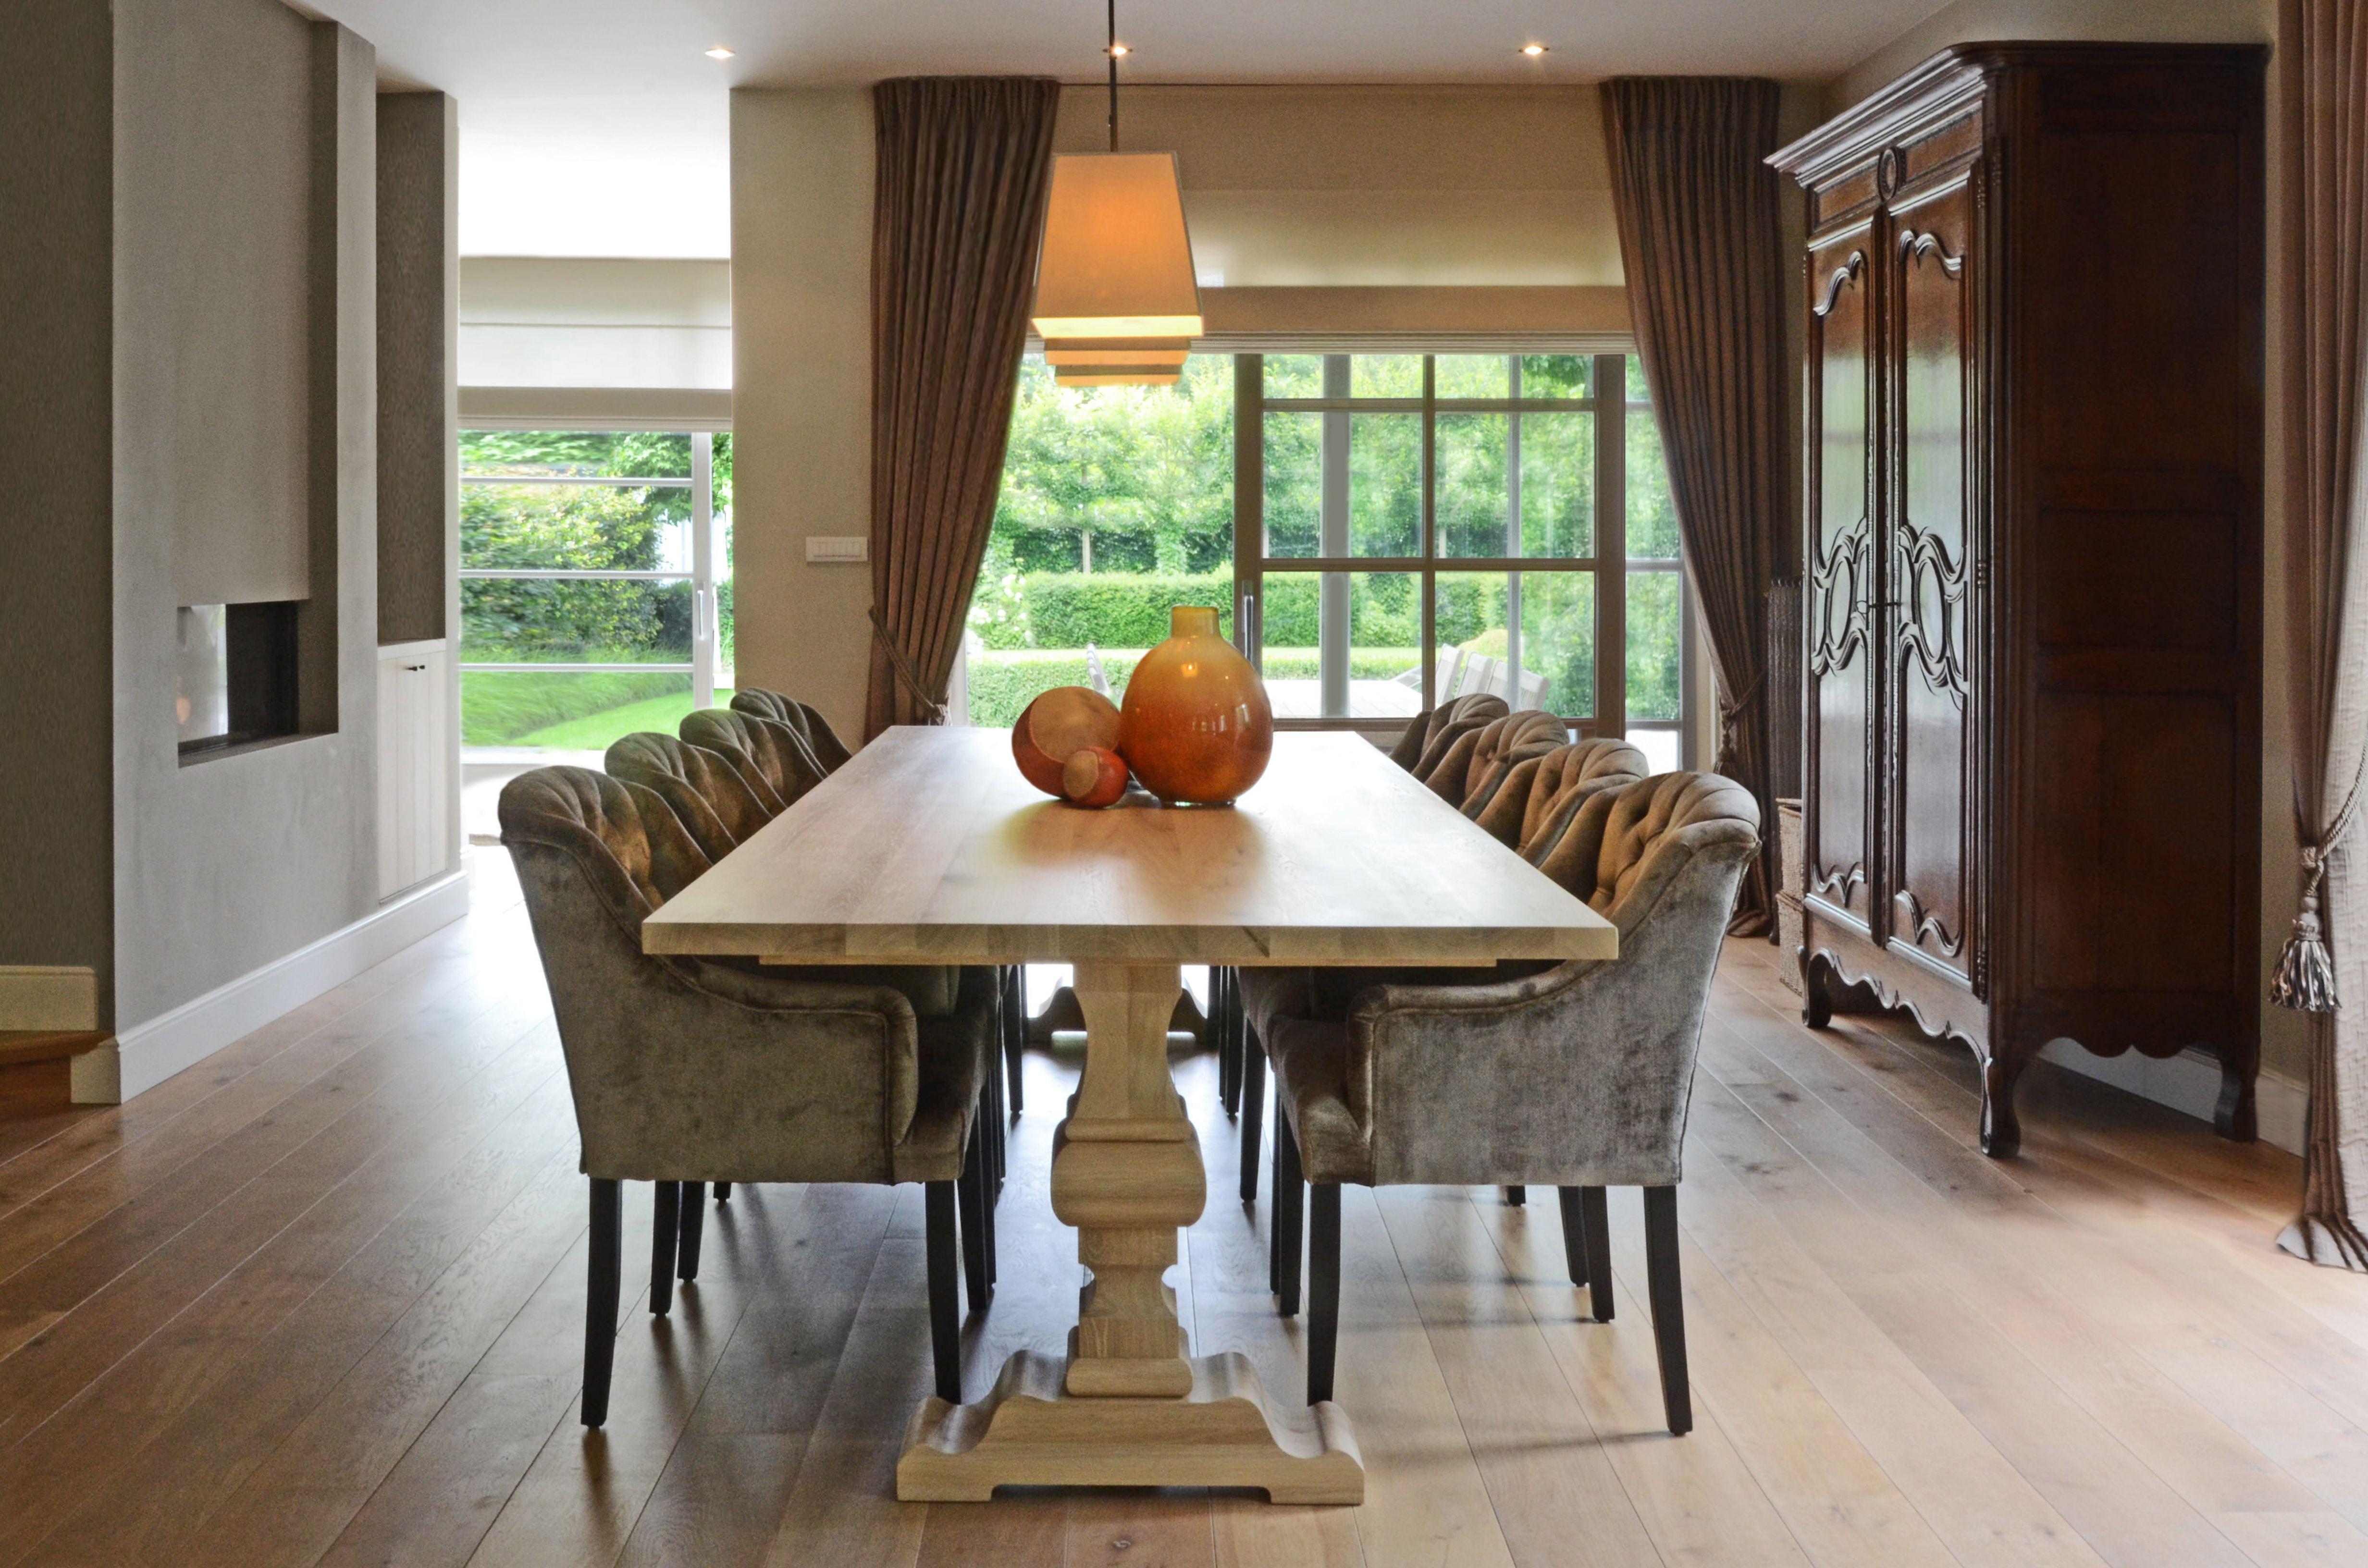 home interiors nl be inspired interior design pinterest interiors. Black Bedroom Furniture Sets. Home Design Ideas